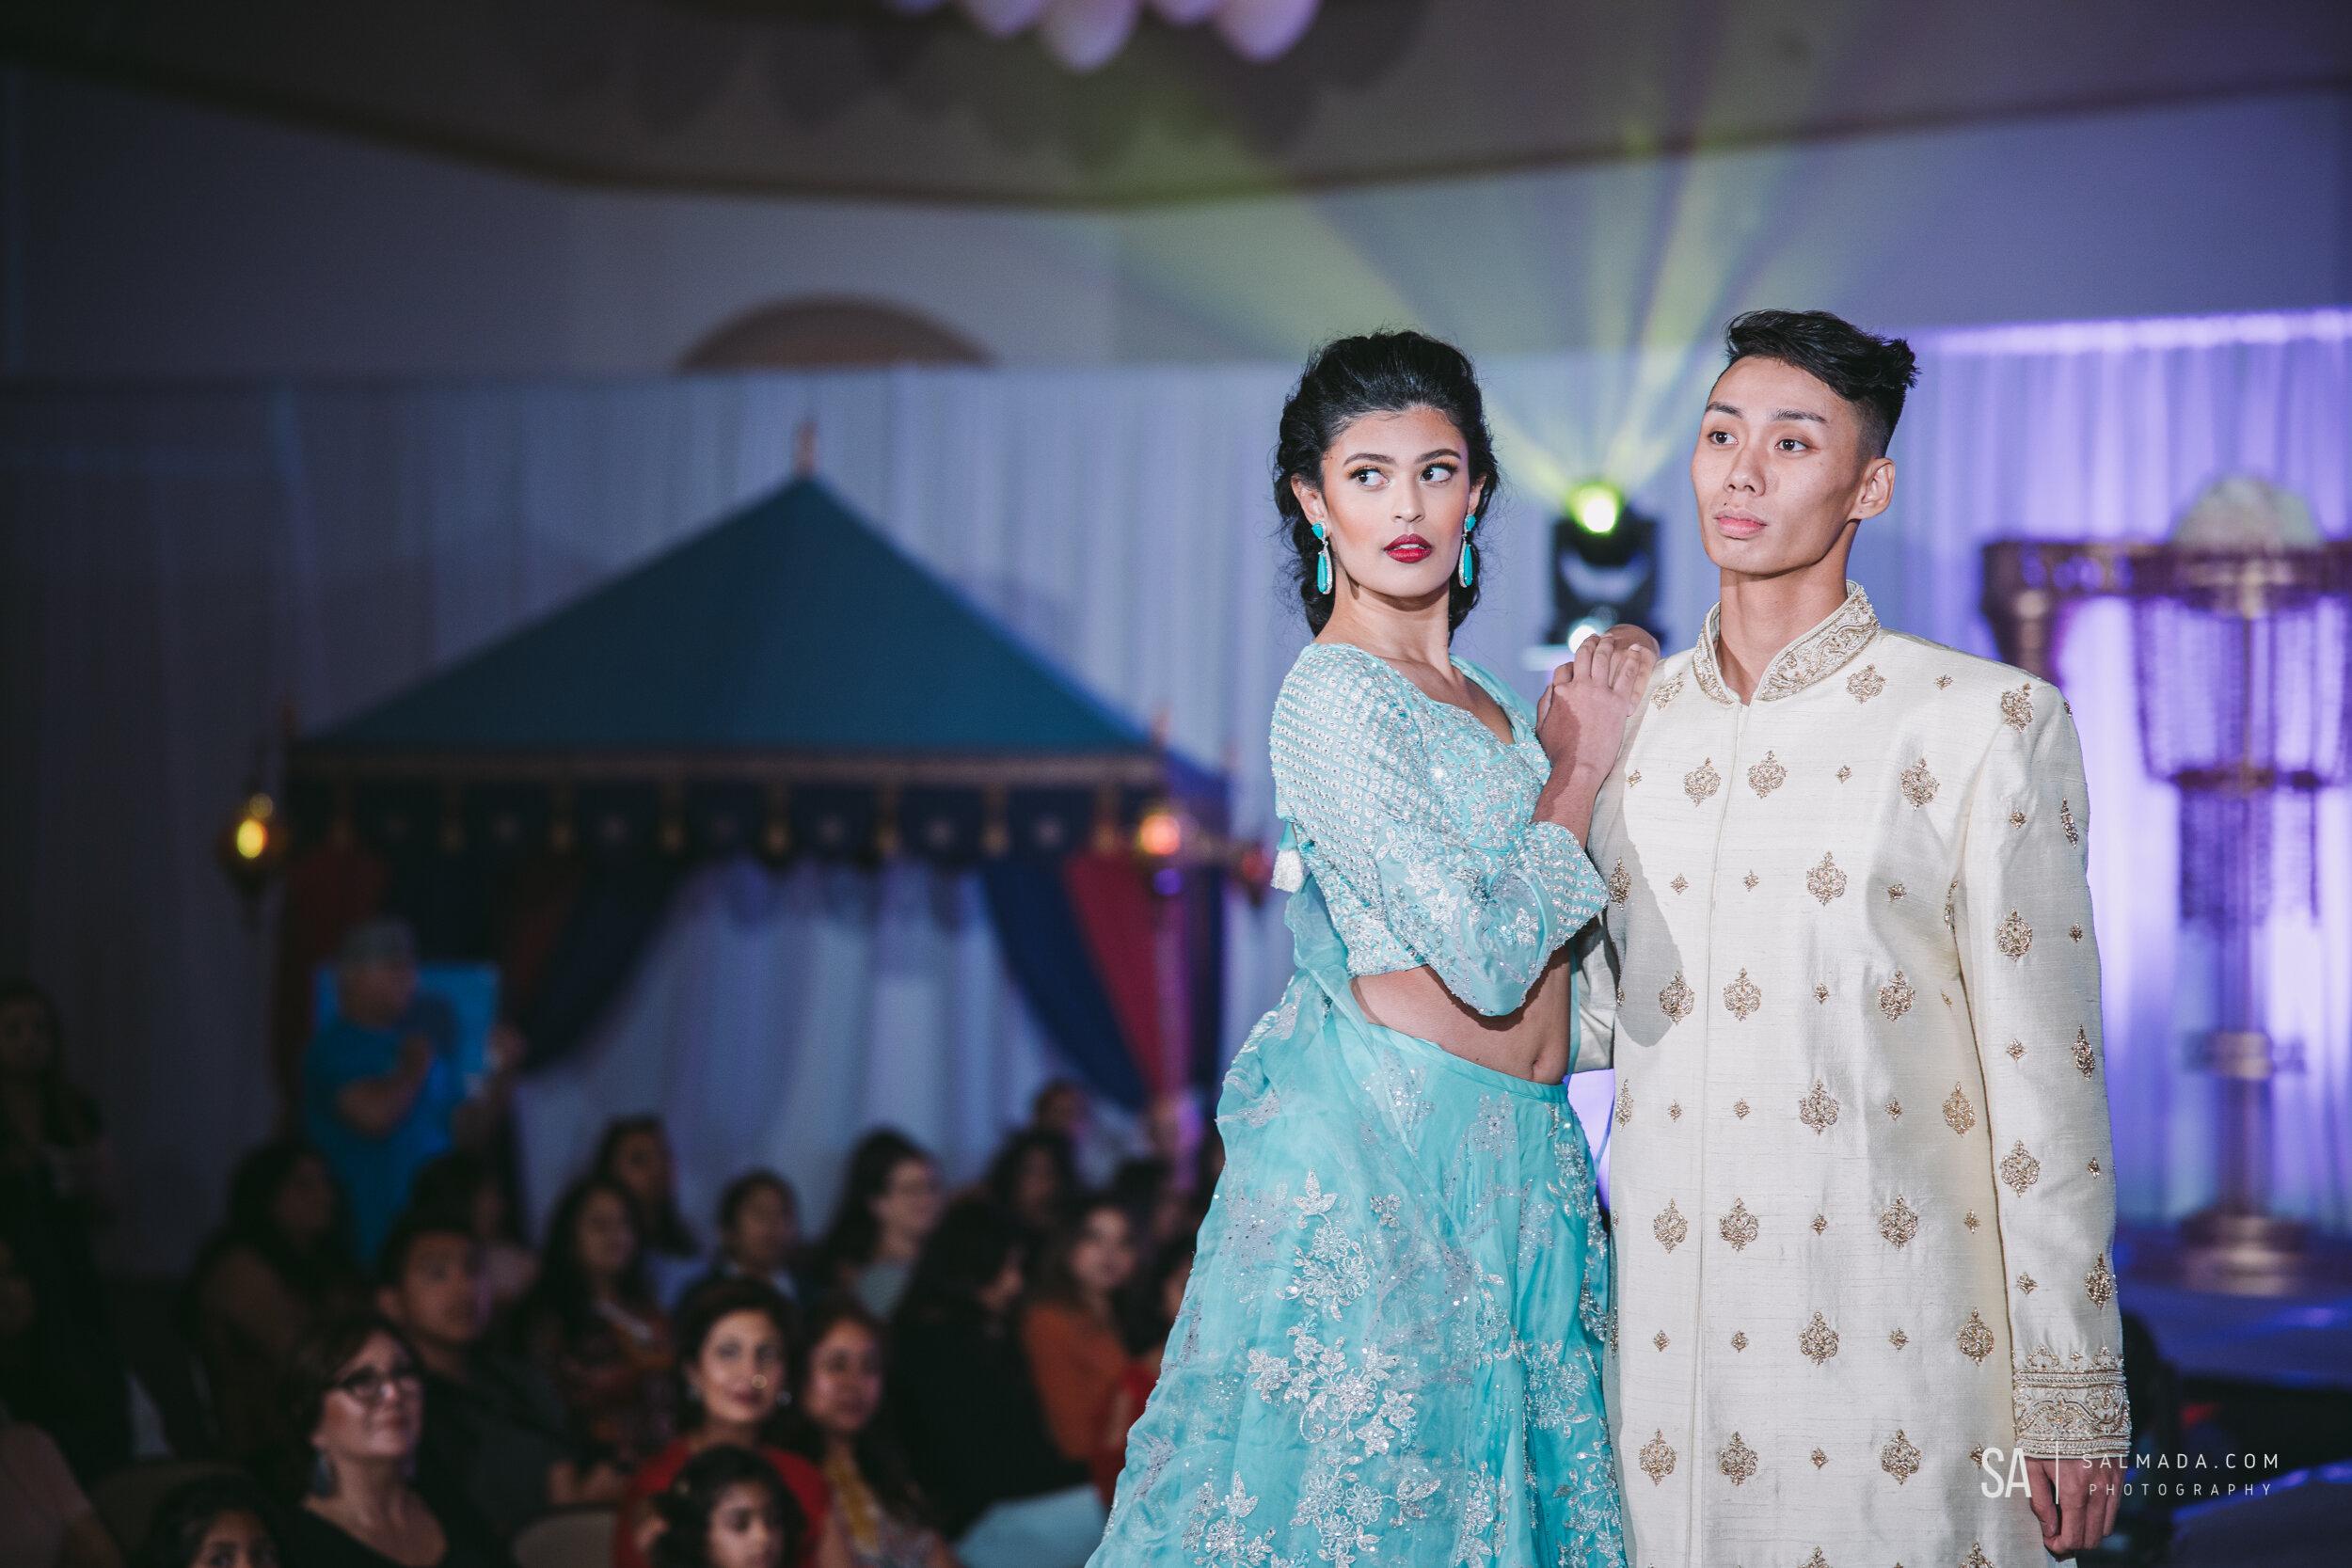 Indian wedding clothes for men.jpg